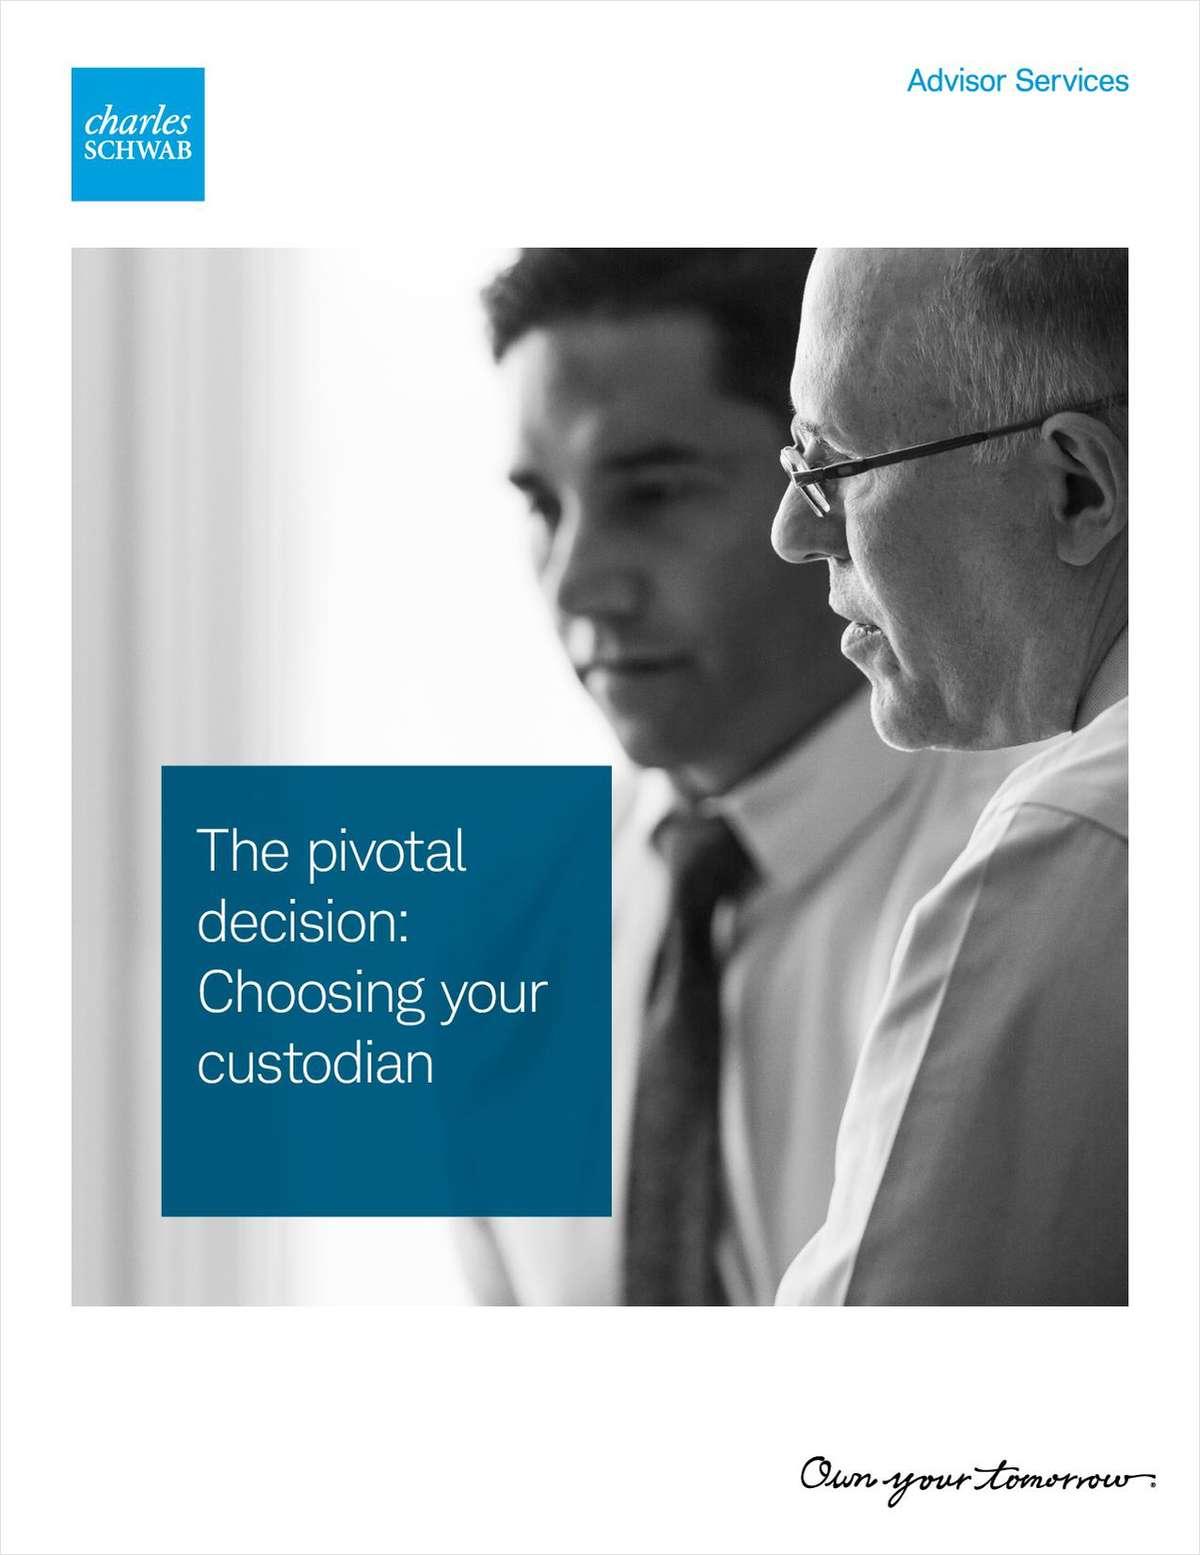 The Pivotal Decision: Choosing your Custodian